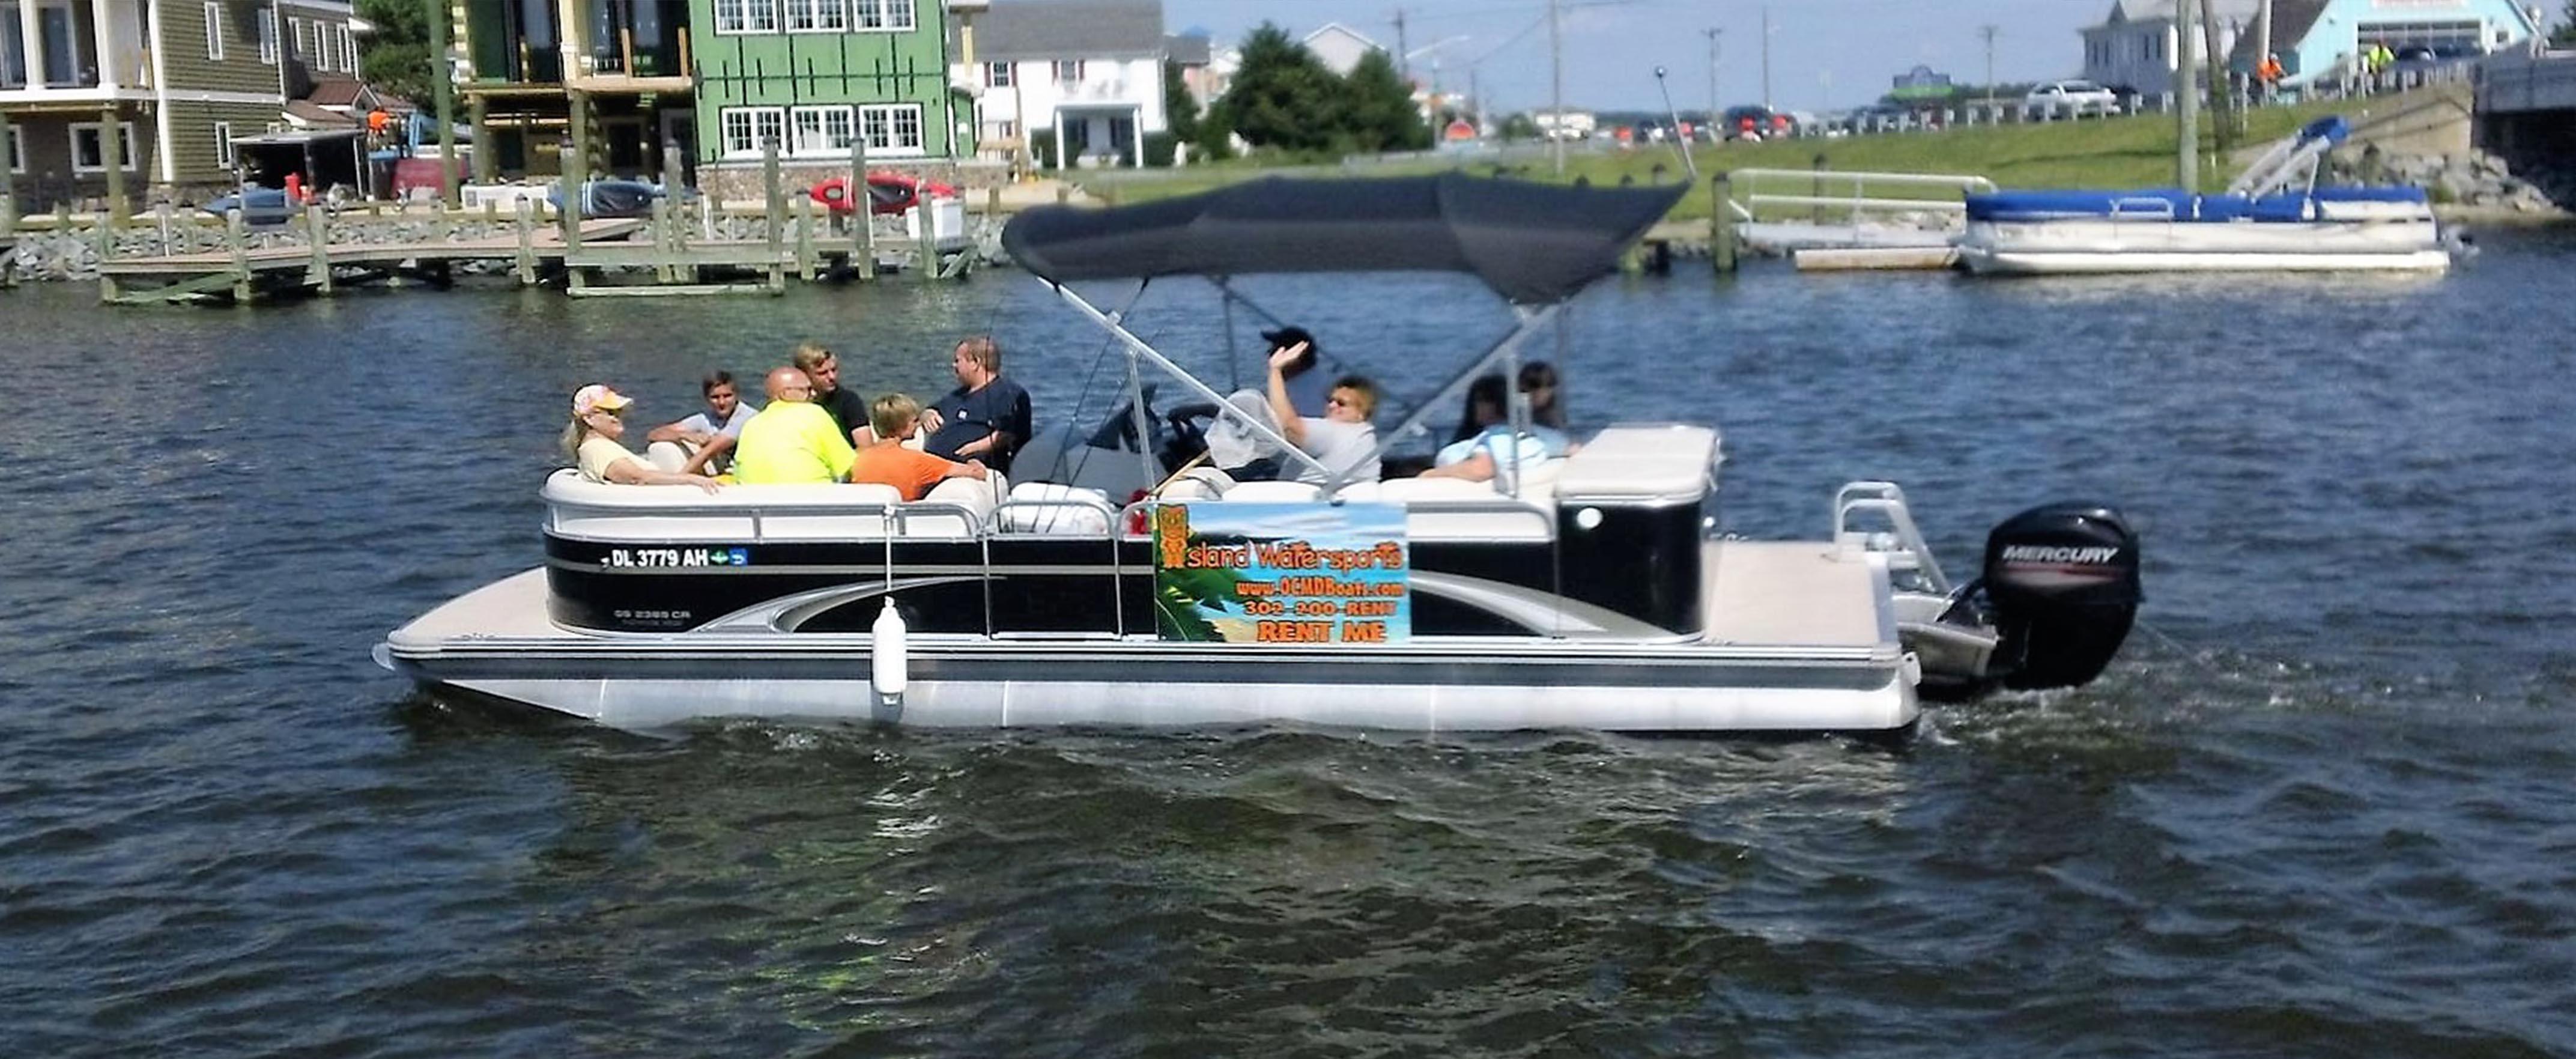 Pontoon Boat Rentals Fenwick Island DE | Ocean City MD